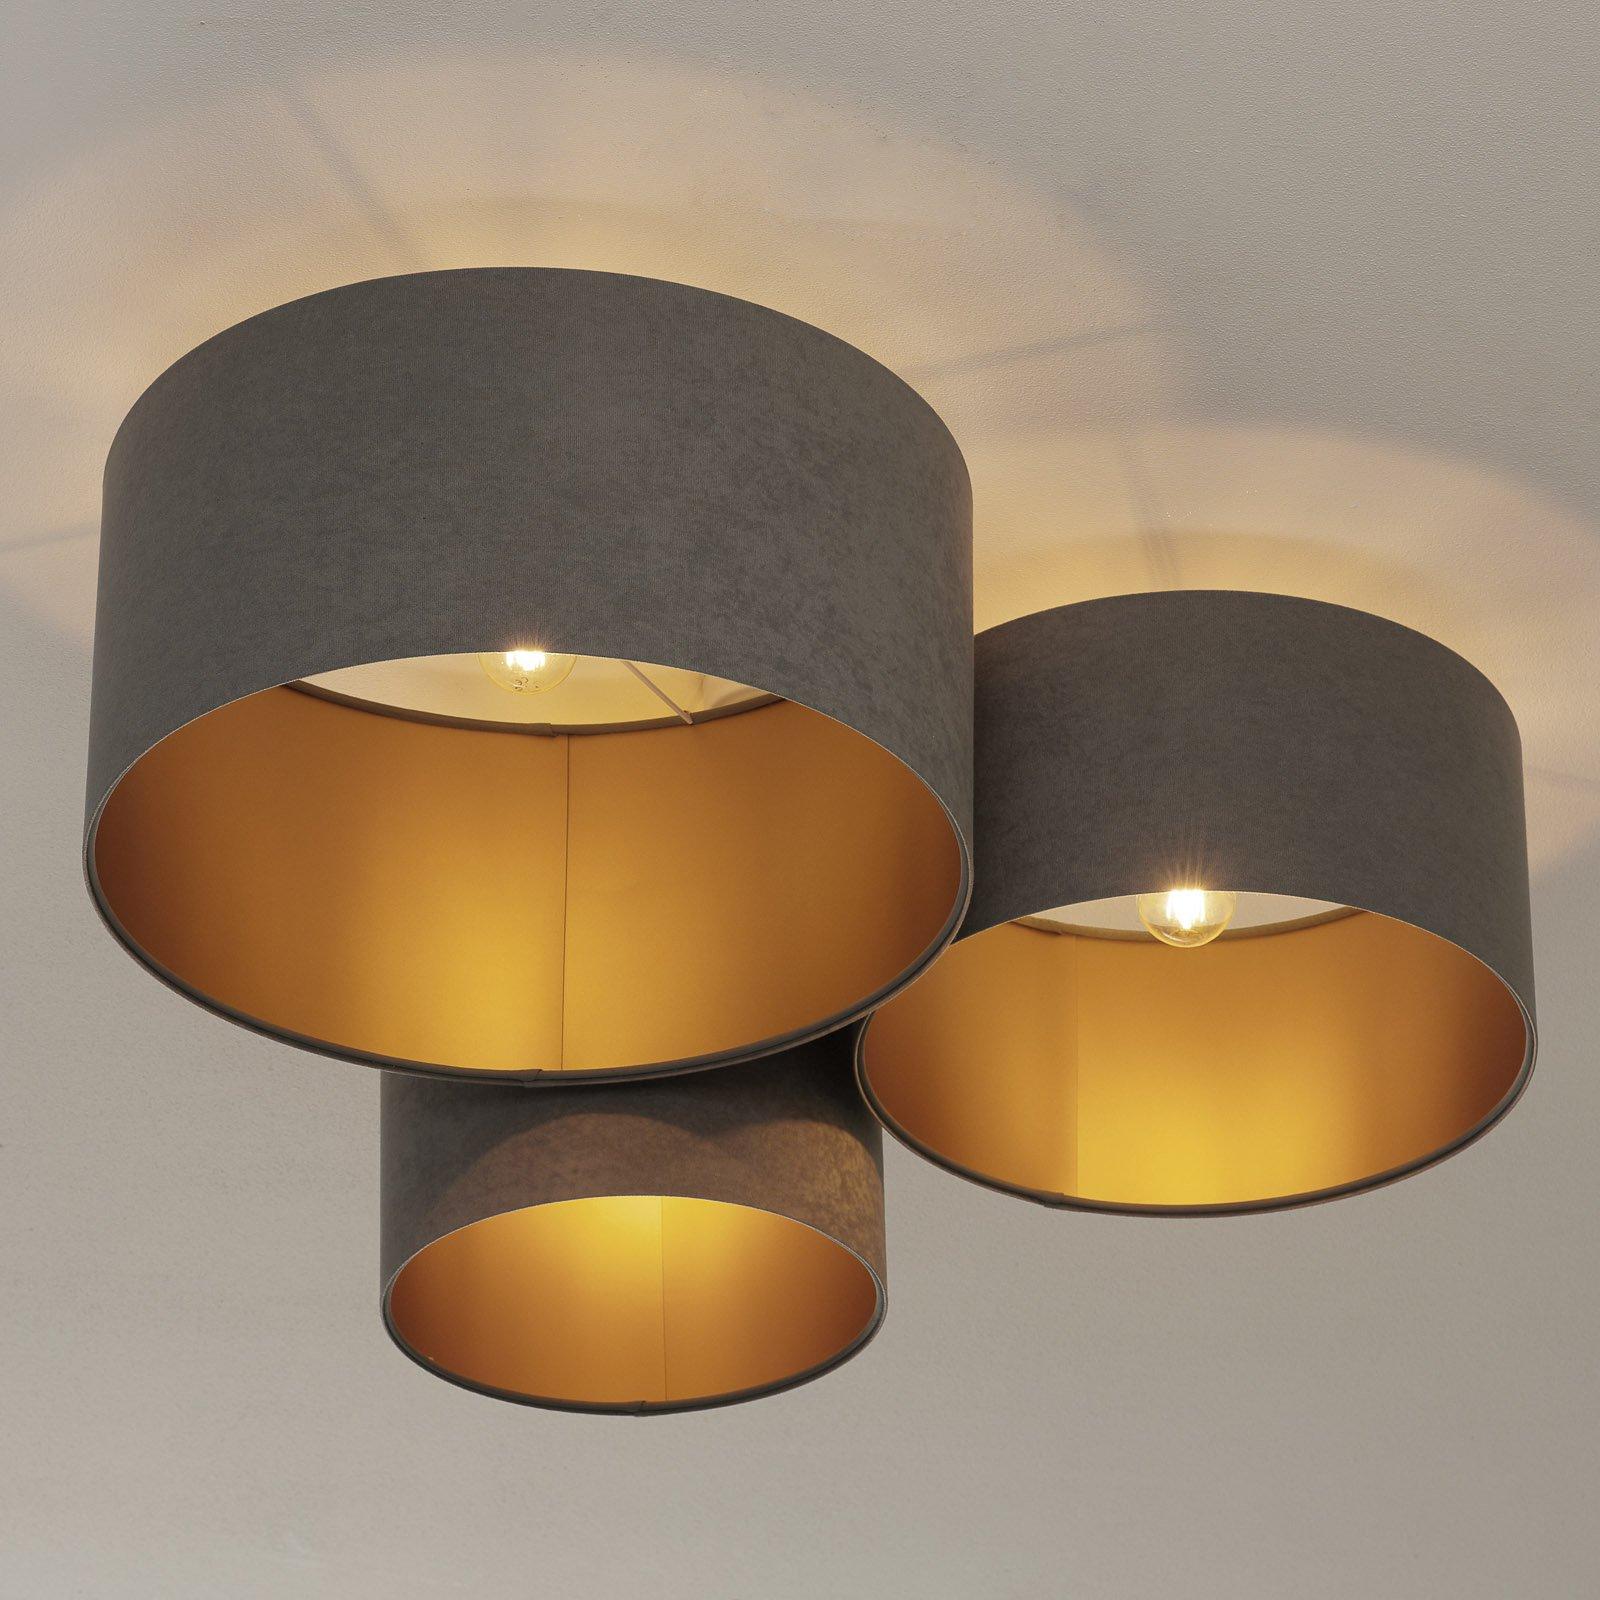 Taklampe 080, 3 lyskilder, lysegrå-gull